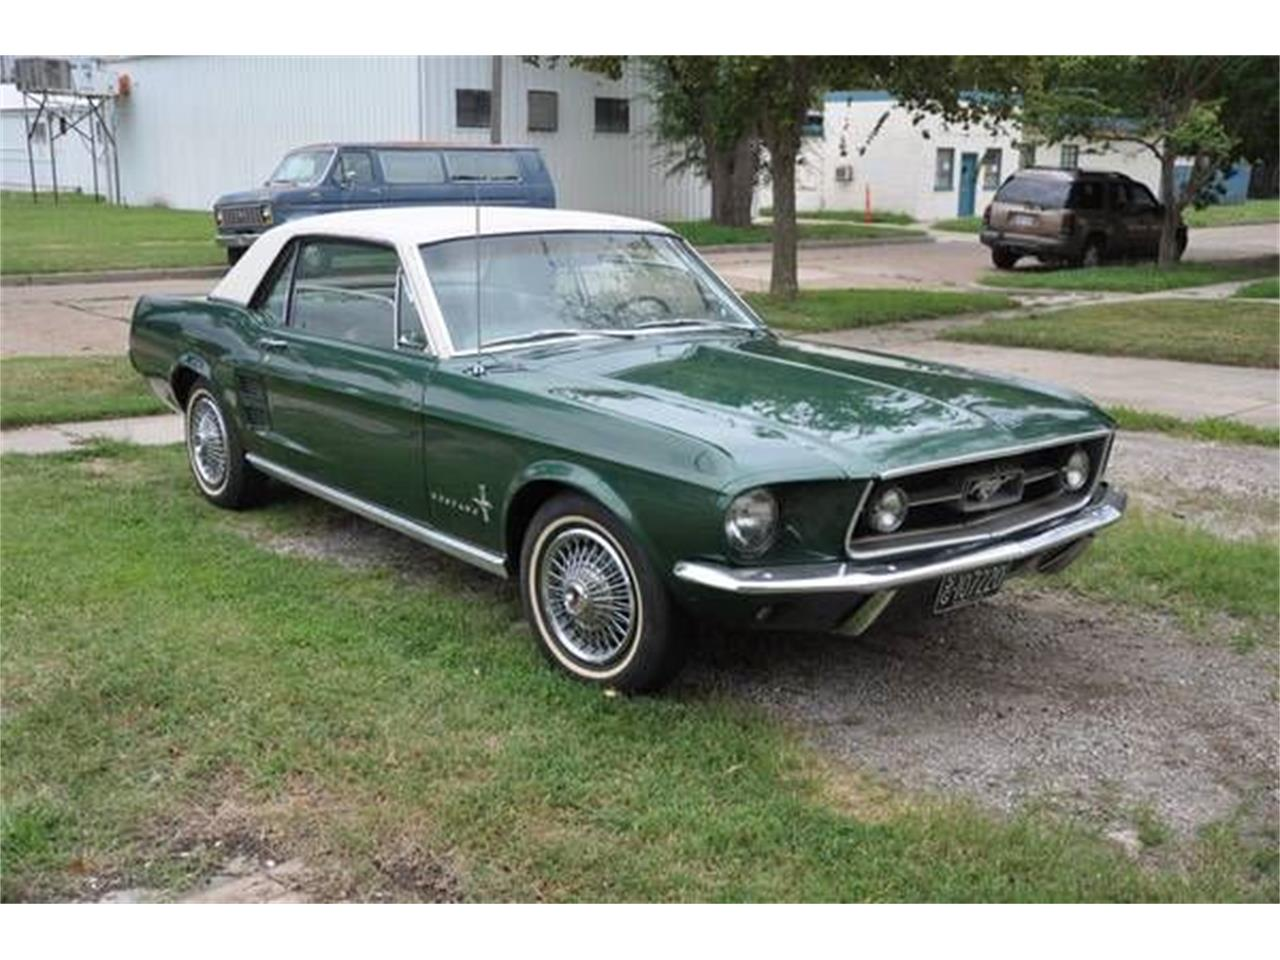 Ford Mustang Gta matching 1967 prix tout compris 1967